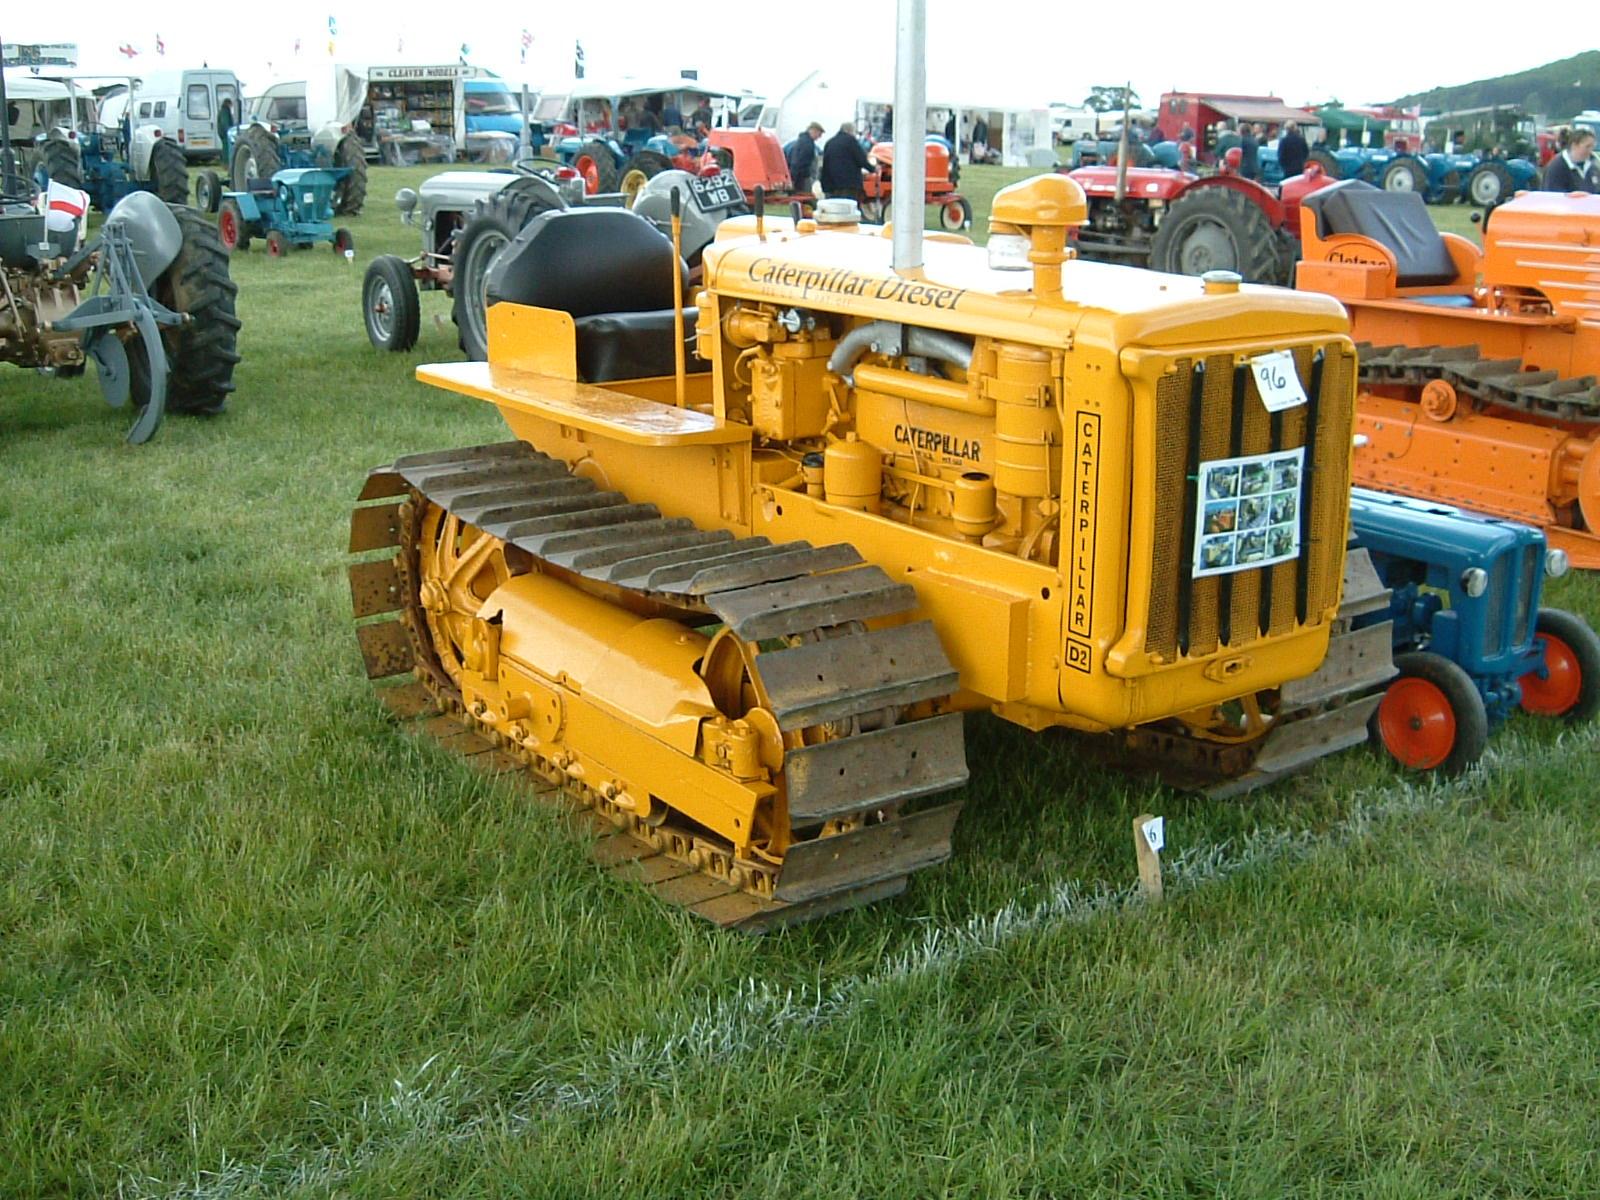 Caterpillar D2 | Tractor & Construction Plant Wiki | FANDOM